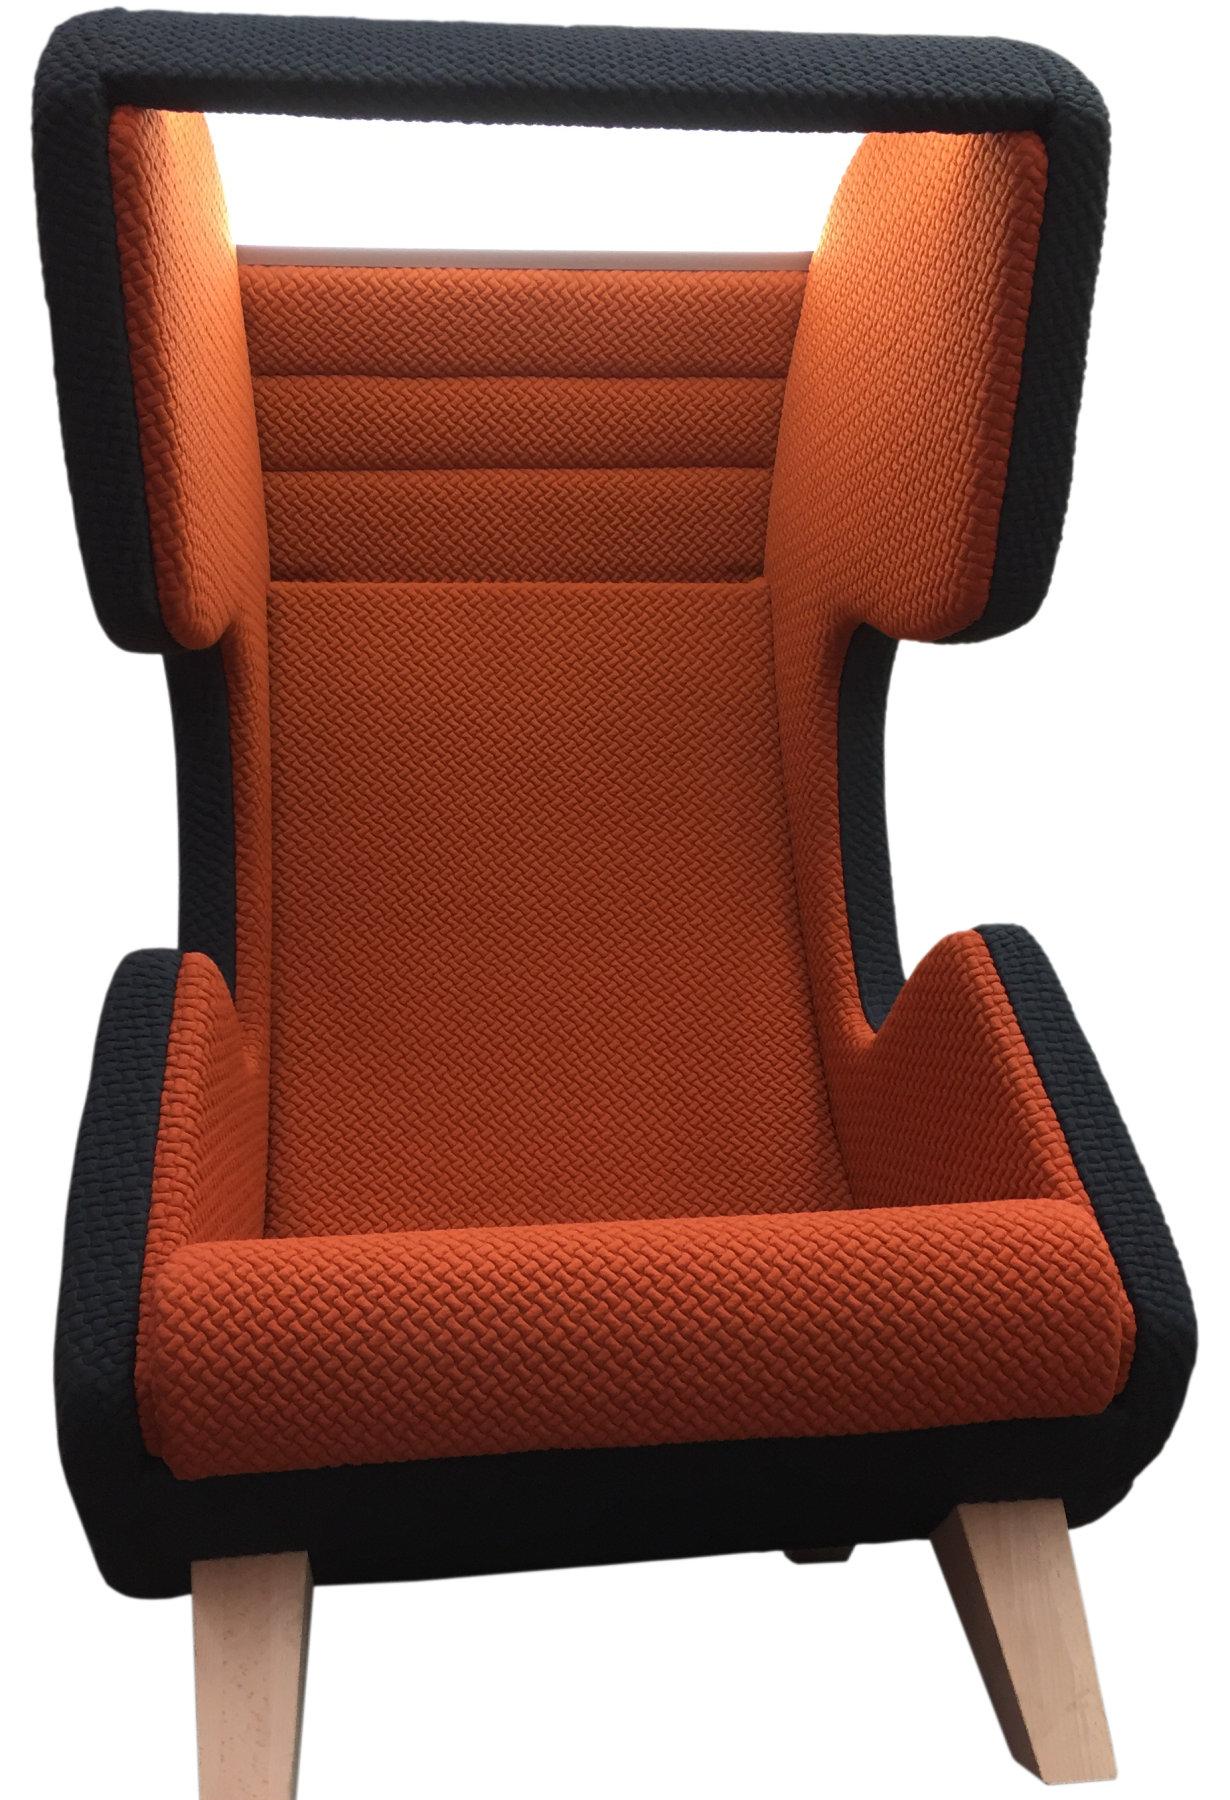 Osram's Chronogy™ HCL chairs